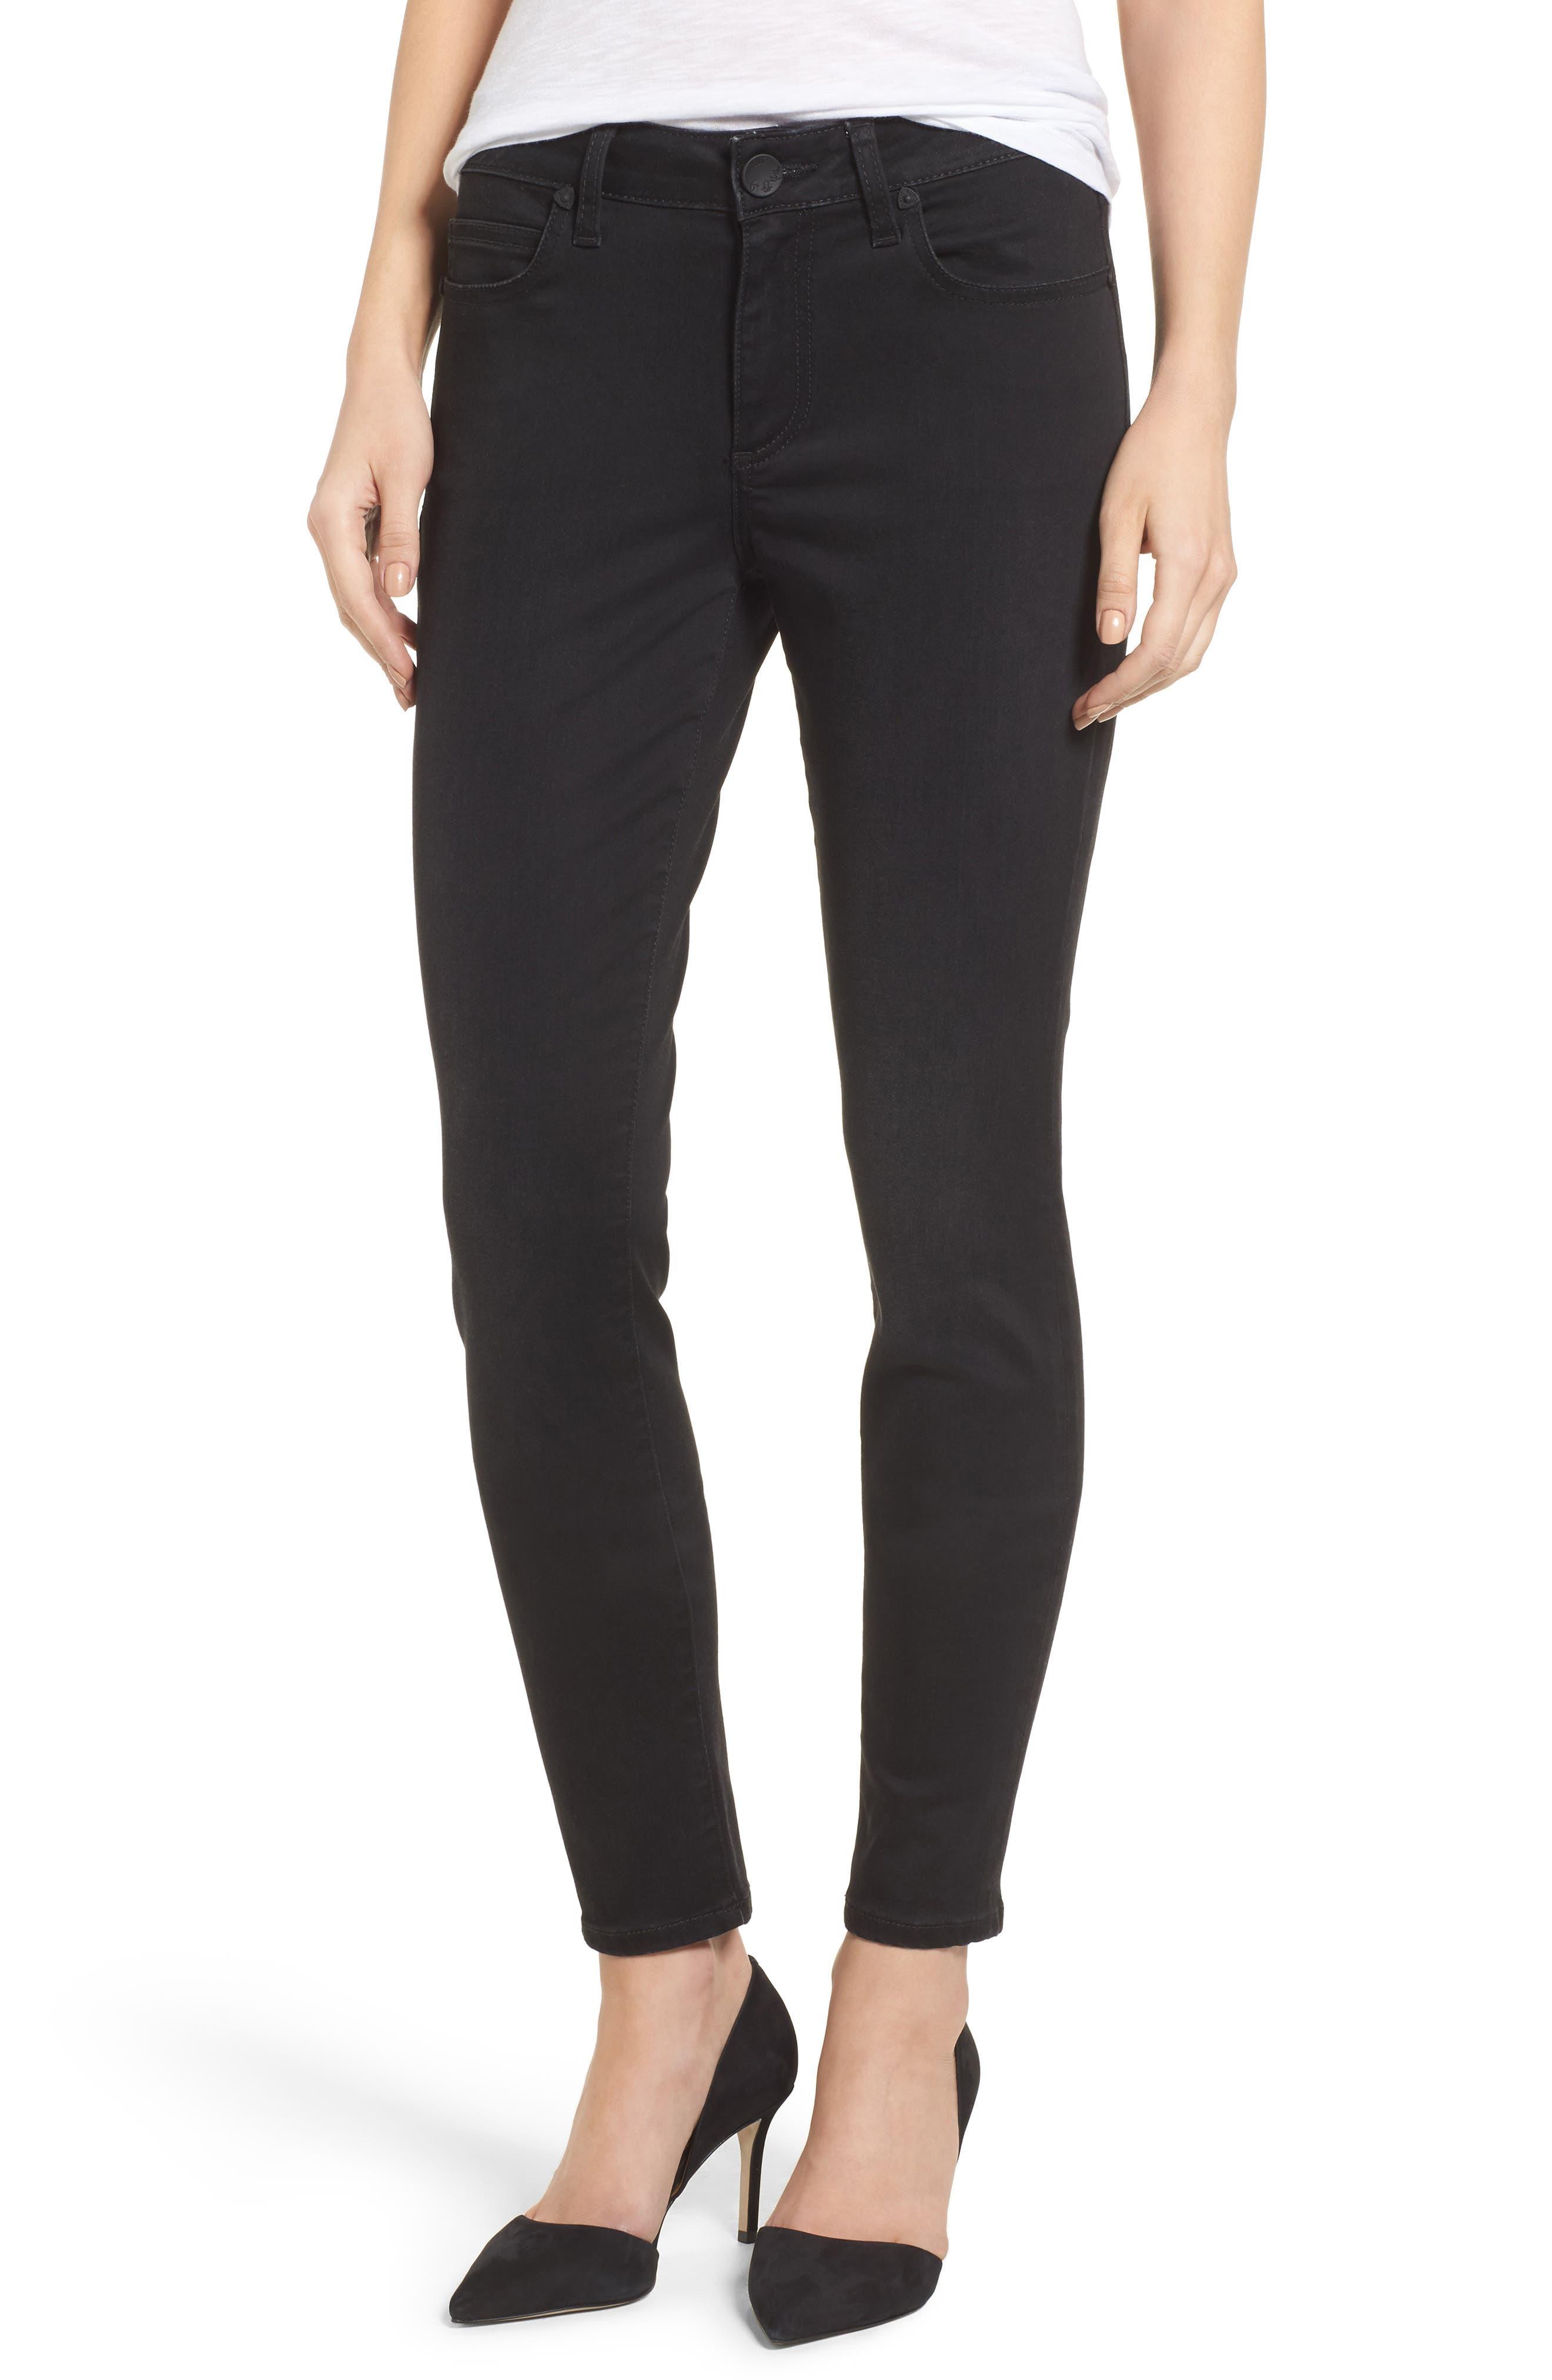 Alternate Image 1 Selected - KUT from the Kloth Mia Curvy Fit Skinny Jeans (Regular & Petite)